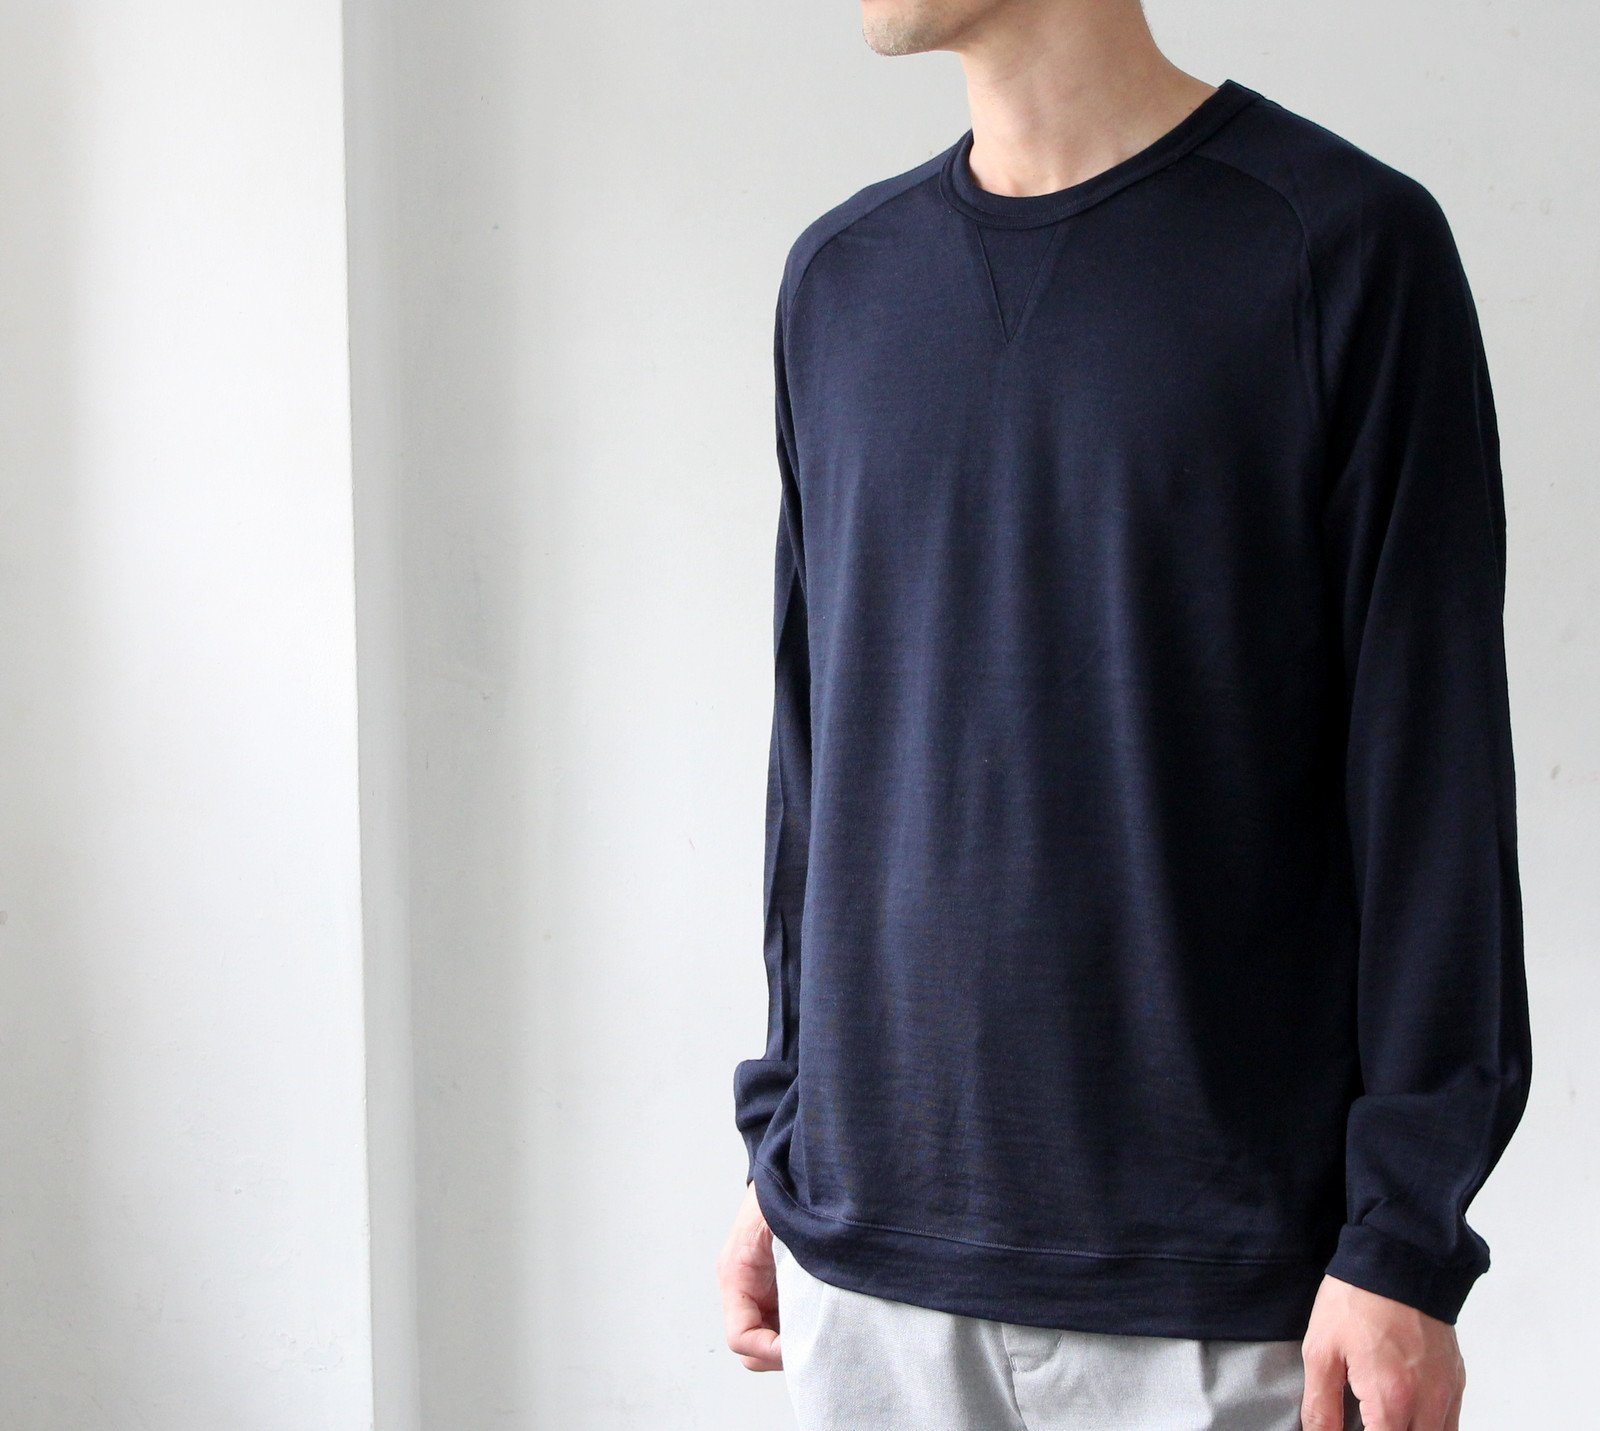 Merino Wool Knit Crew Neck_c0379477_20422291.jpg